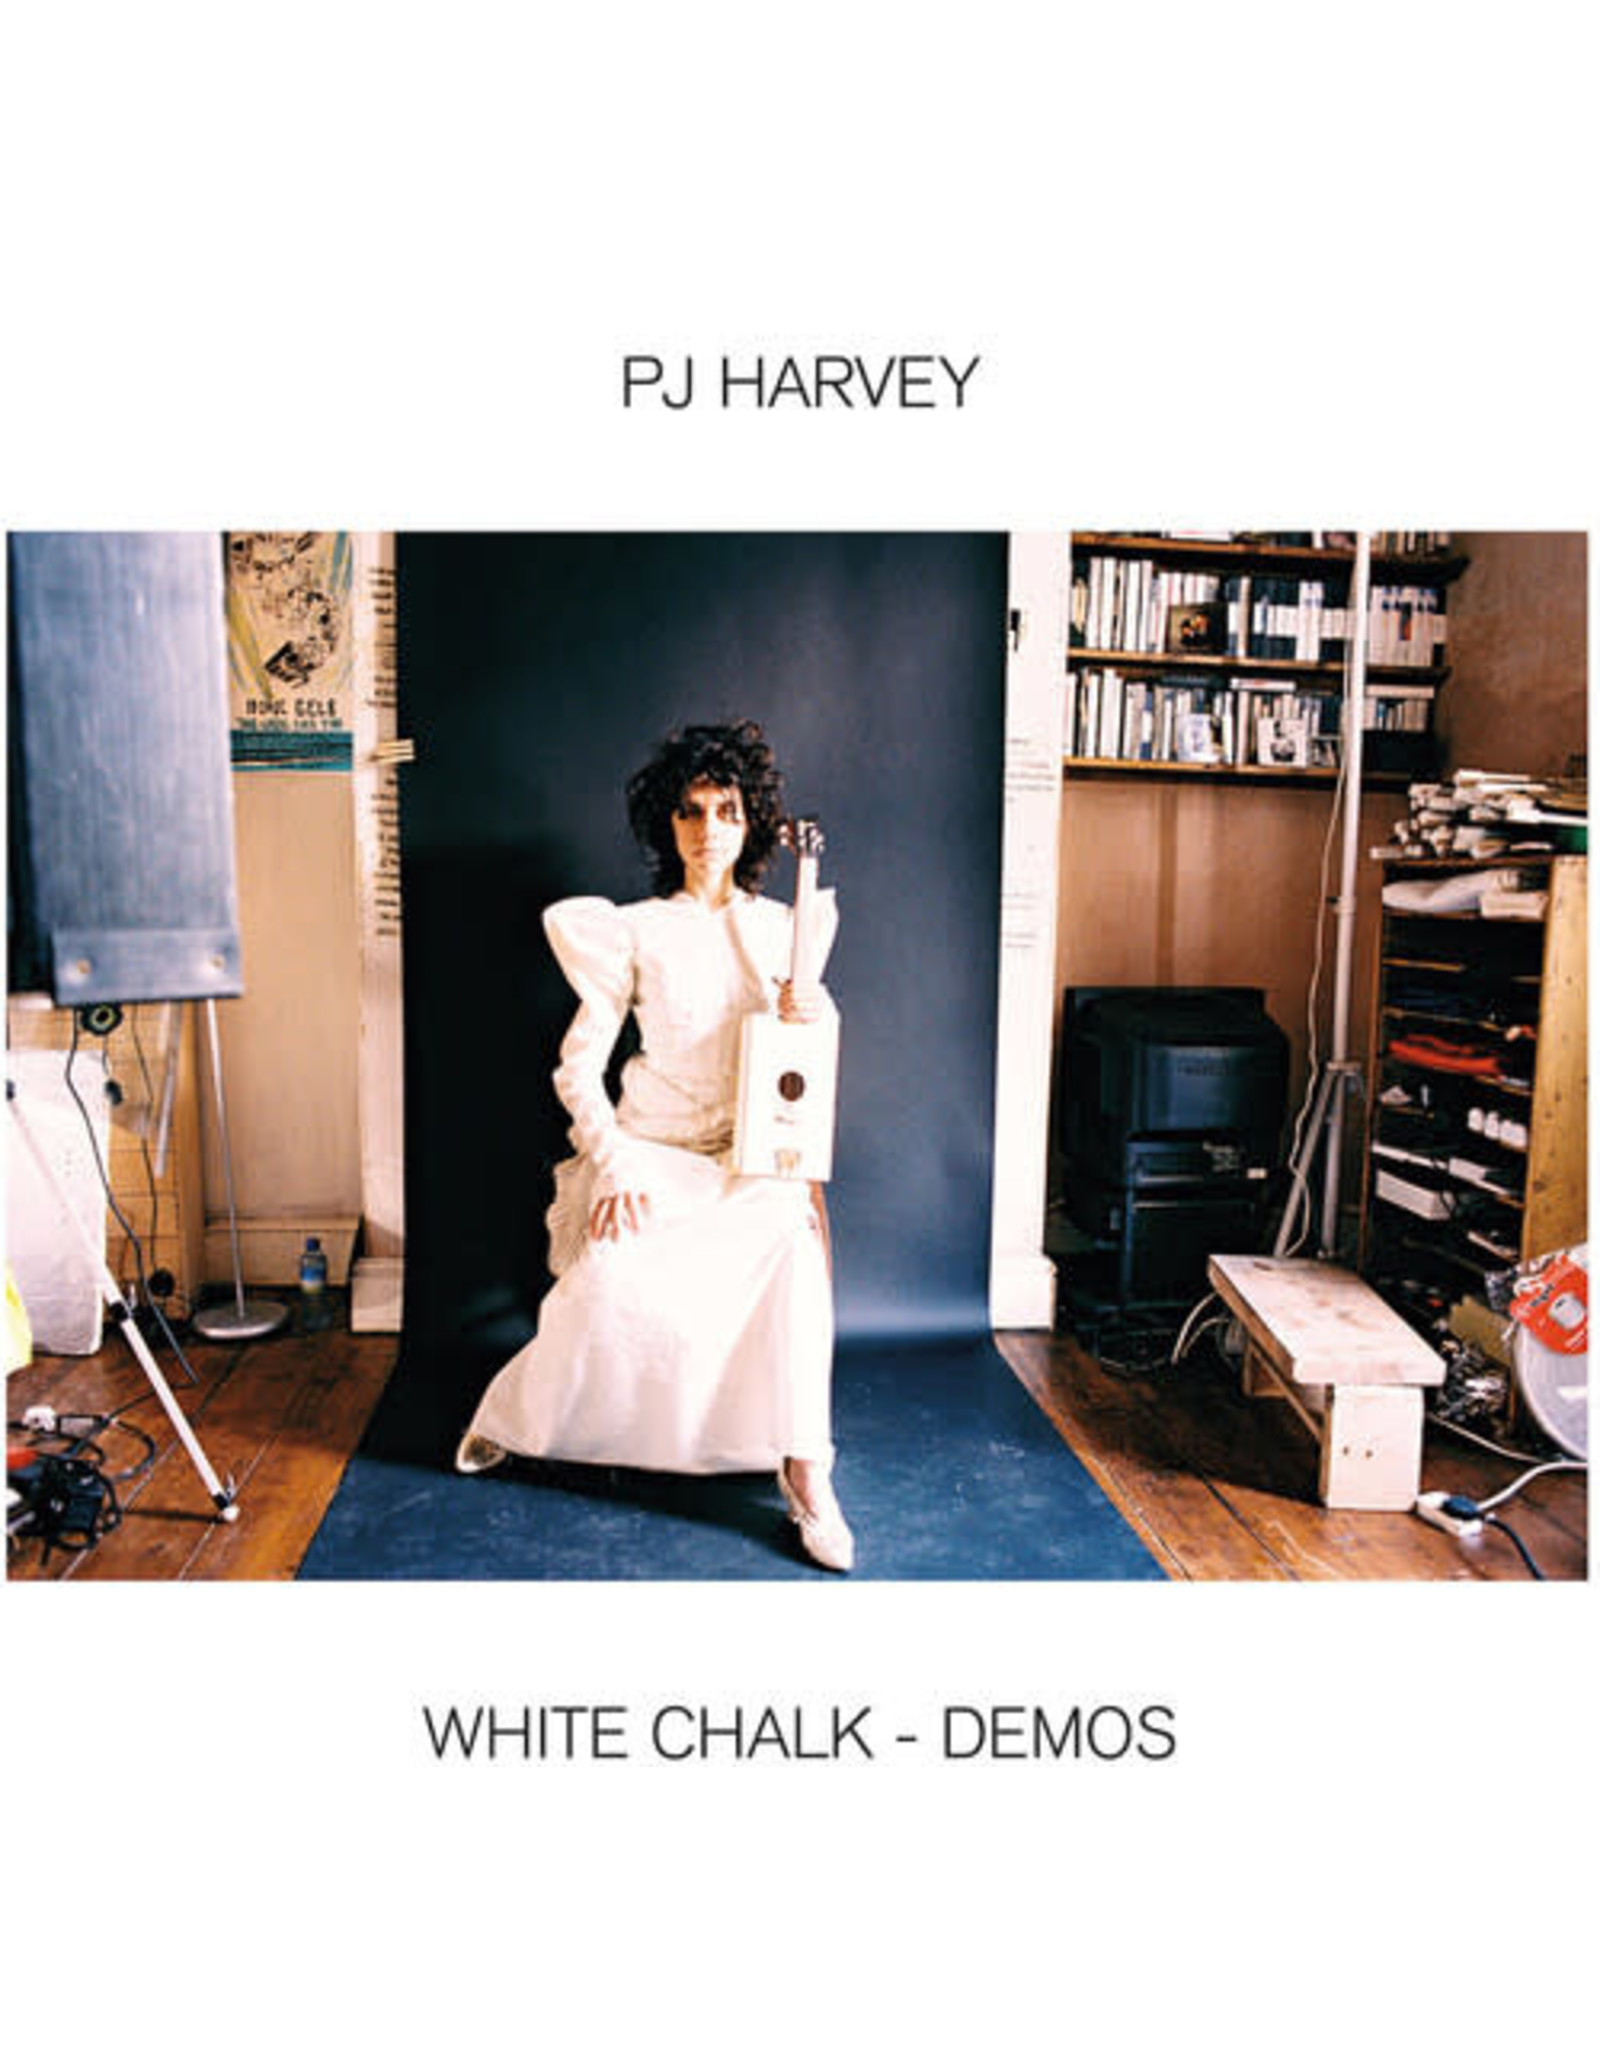 New Vinyl PJ Harvey - White Chalk (Demos) LP